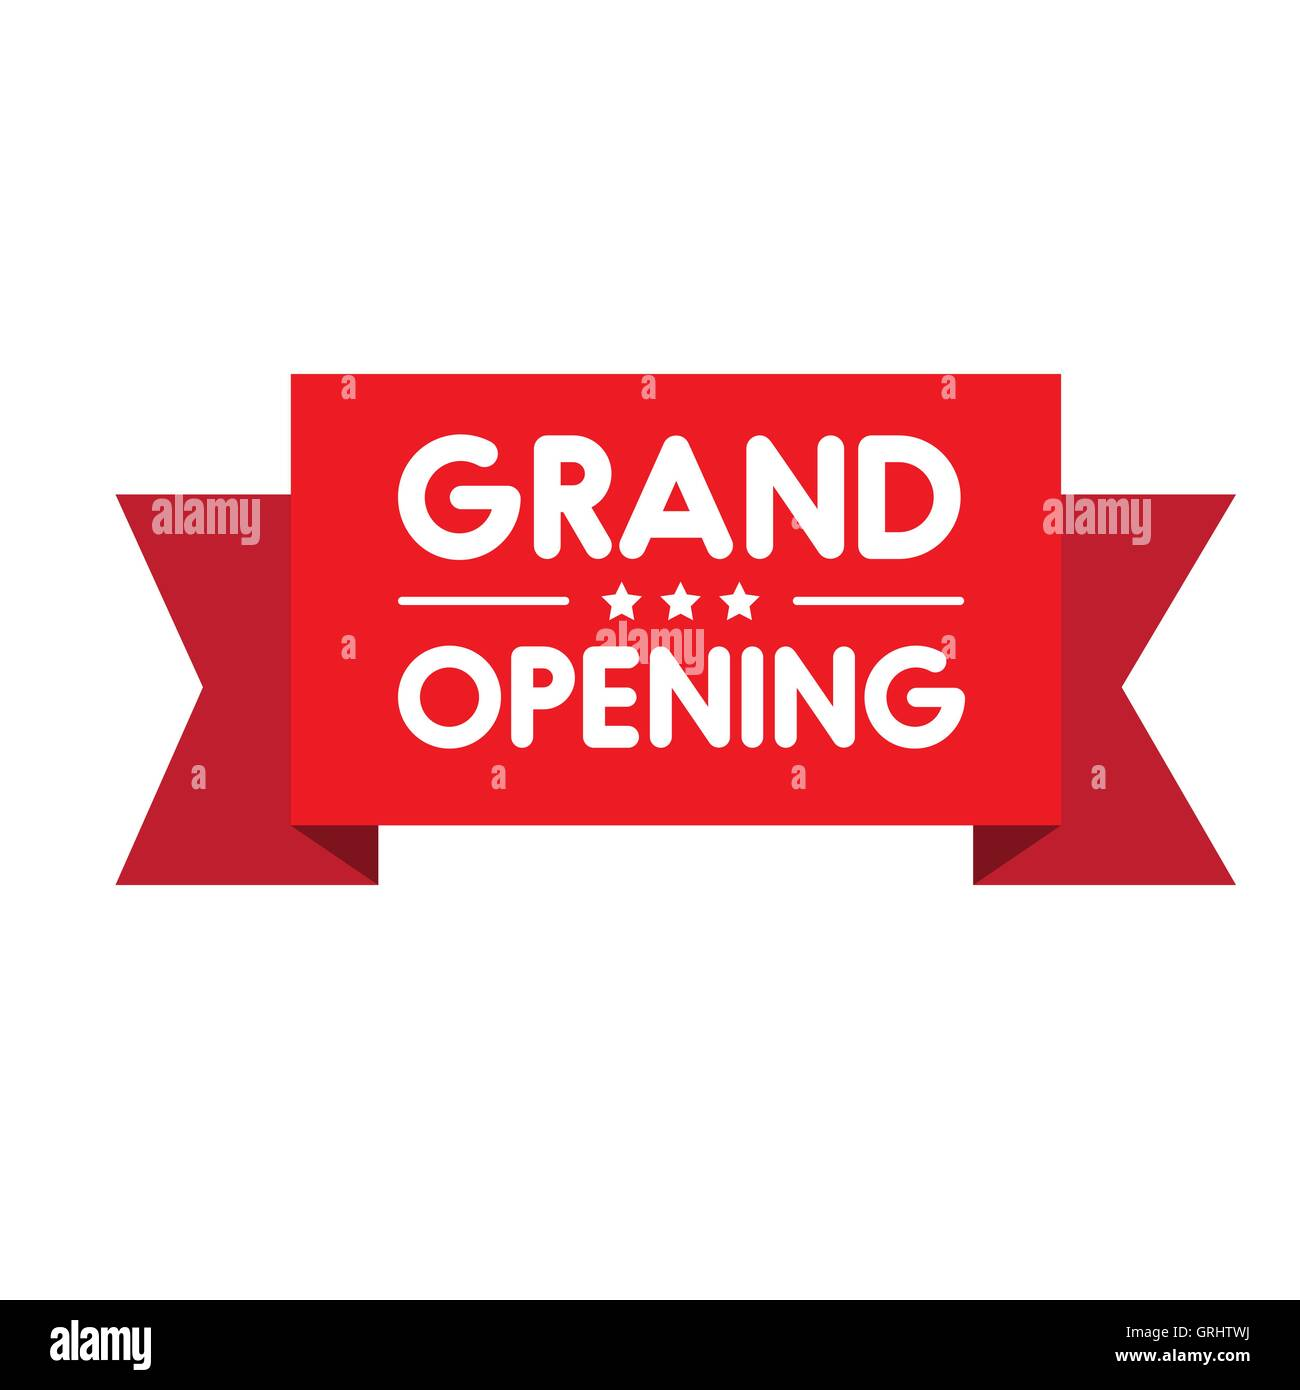 Grand opening invitation label lettering stock vector art grand opening invitation label lettering stopboris Images